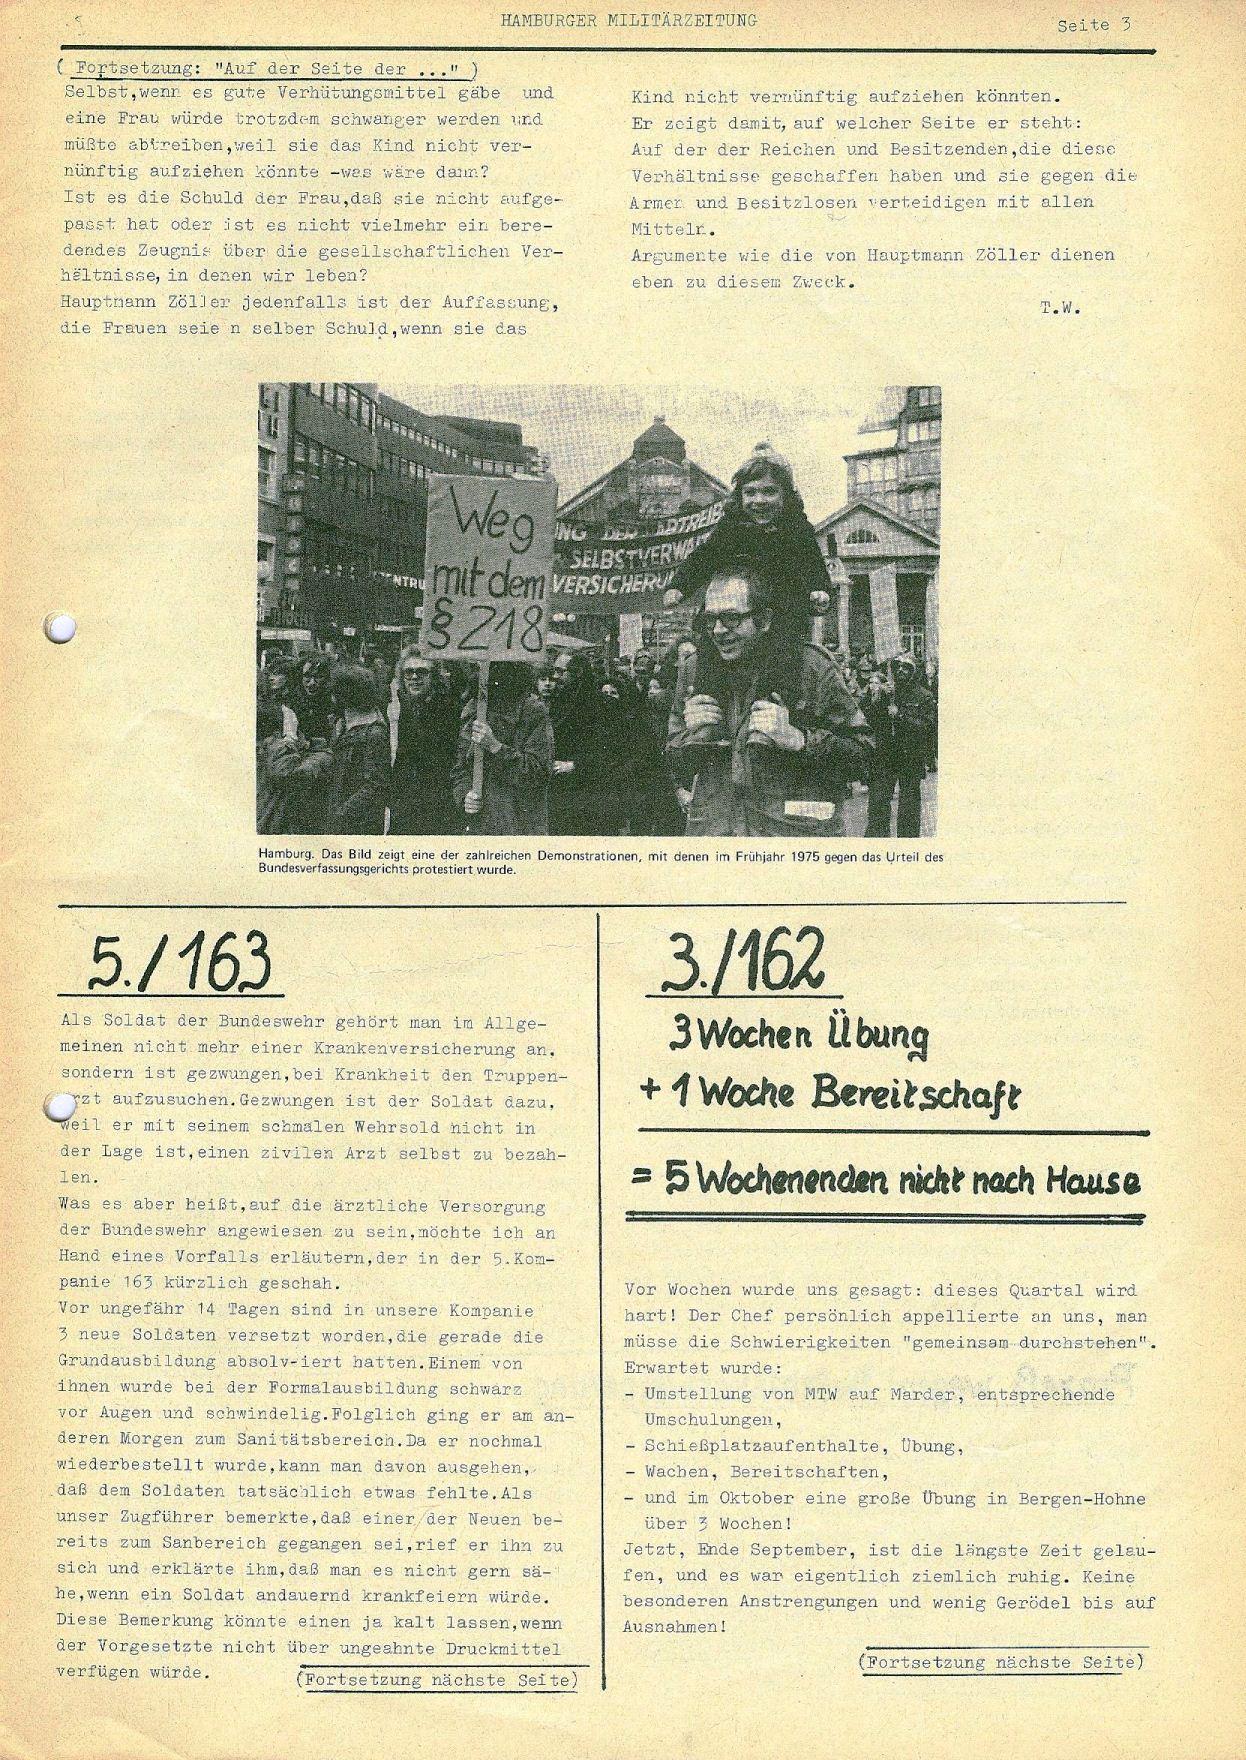 Hamburg_SRK102